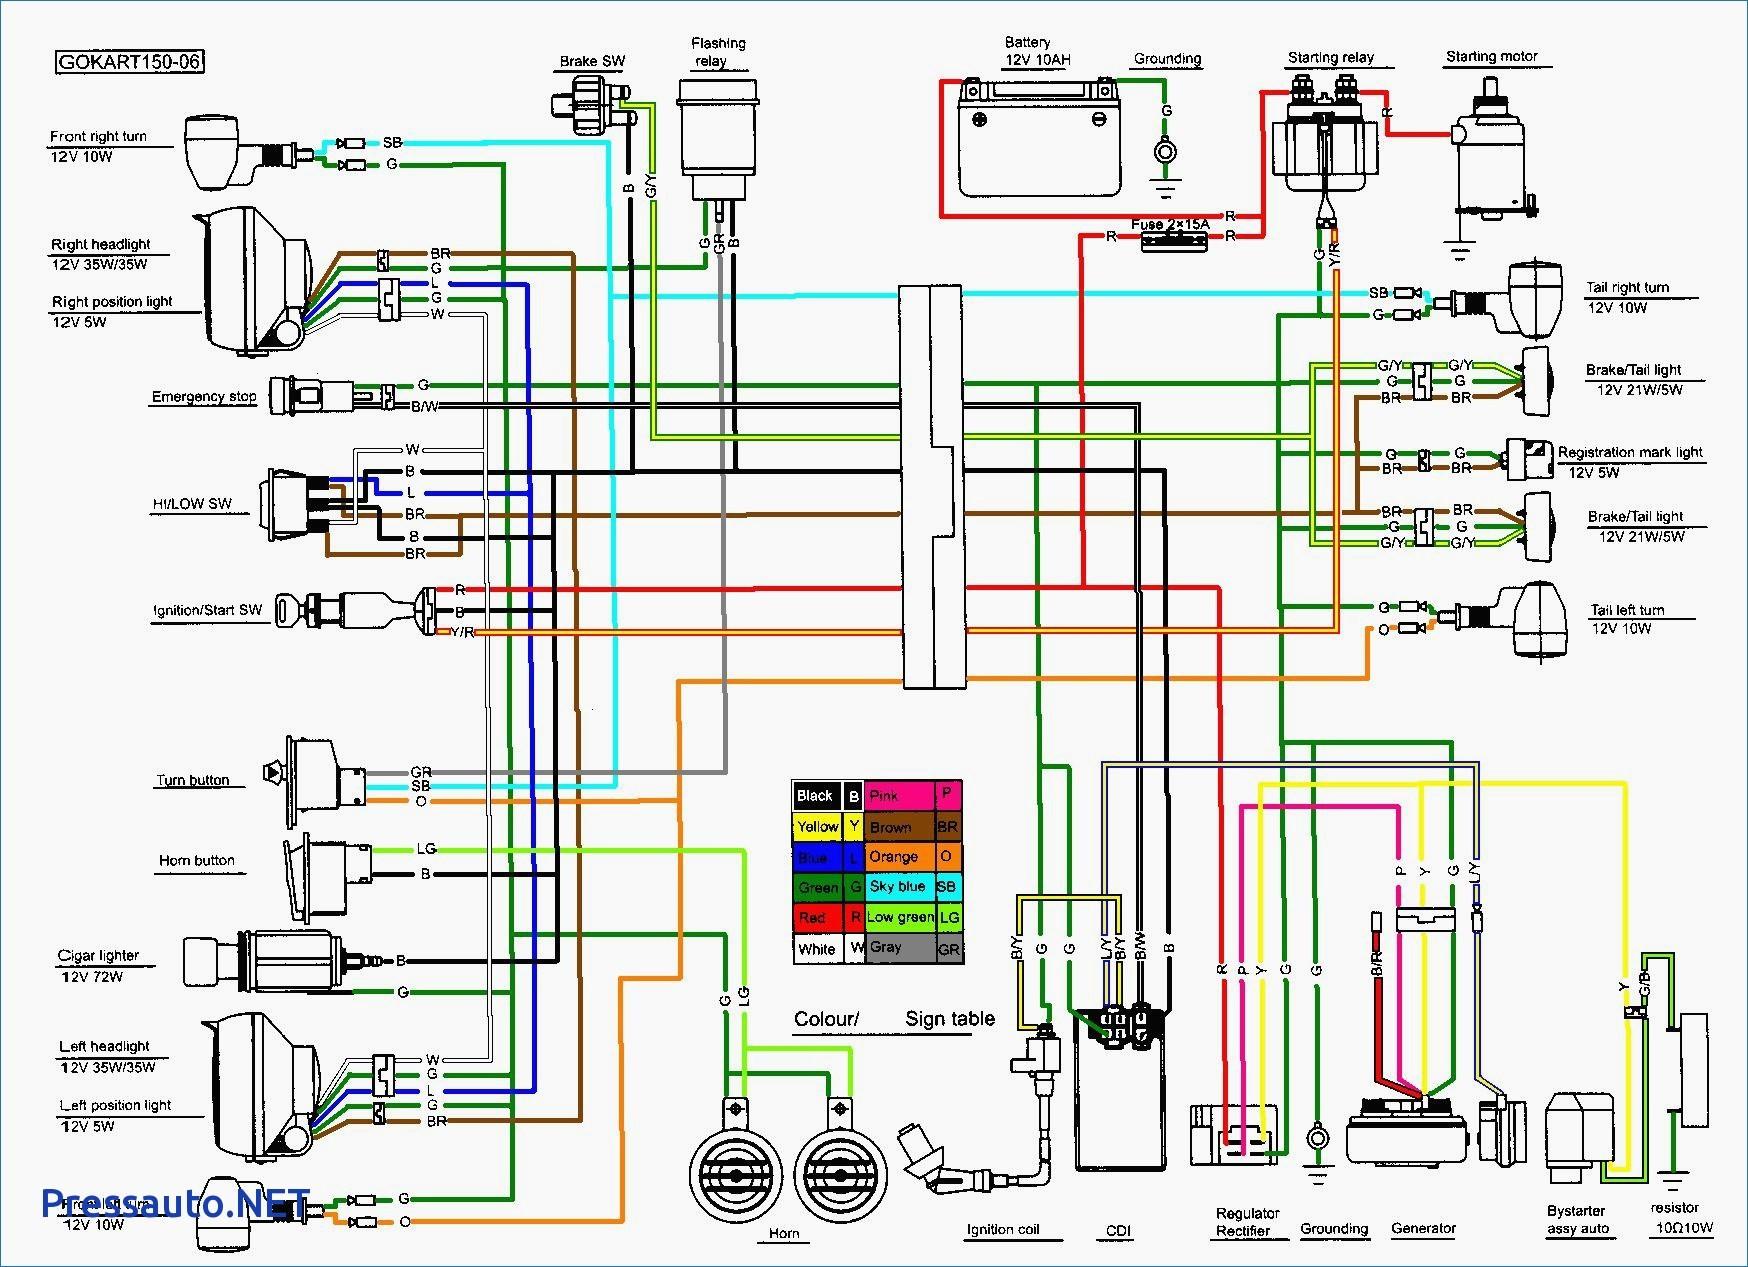 6 pin ac cdi wiring diagram 1994 honda accord engine scooter racing library